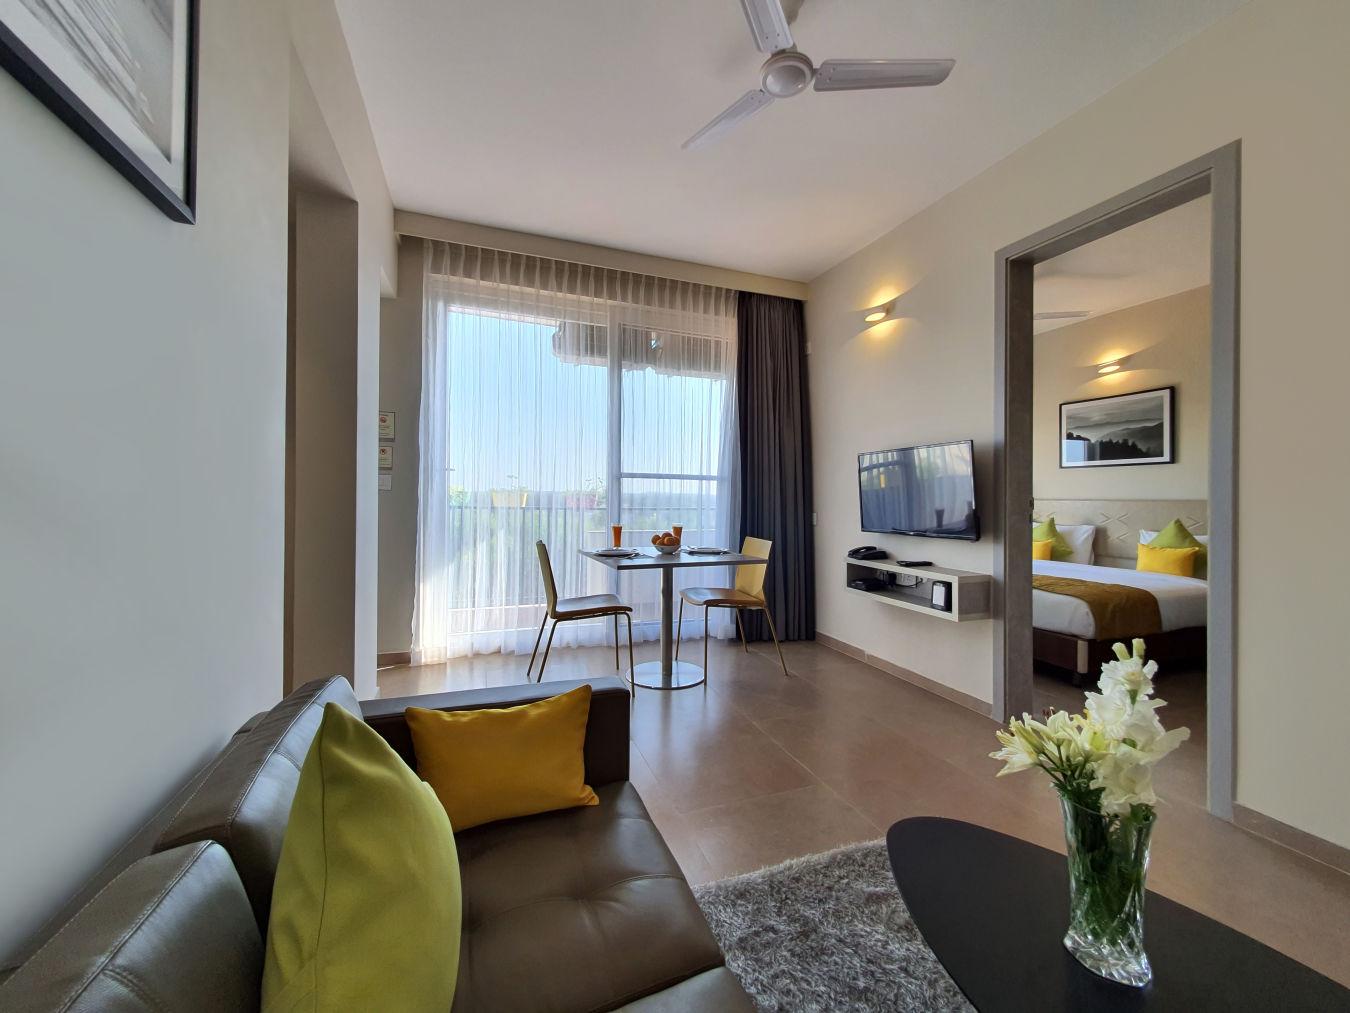 rooms near Bangalore International Airport  rooms at Bangalore International Airport   rooms near bangalore international airport